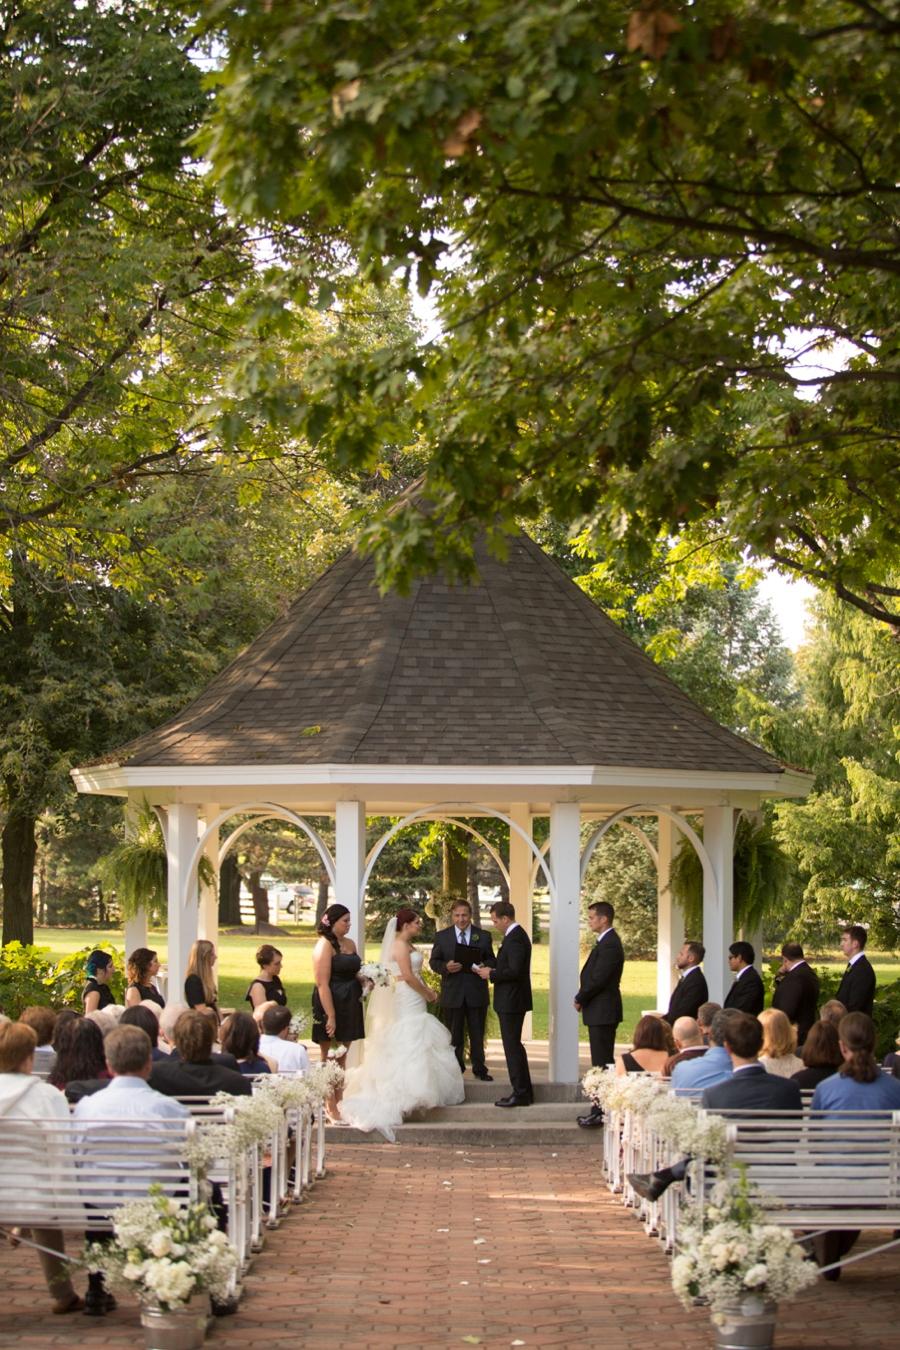 Polen Farm Wedding, Kettering, Ohio : Johannah & Evan ...